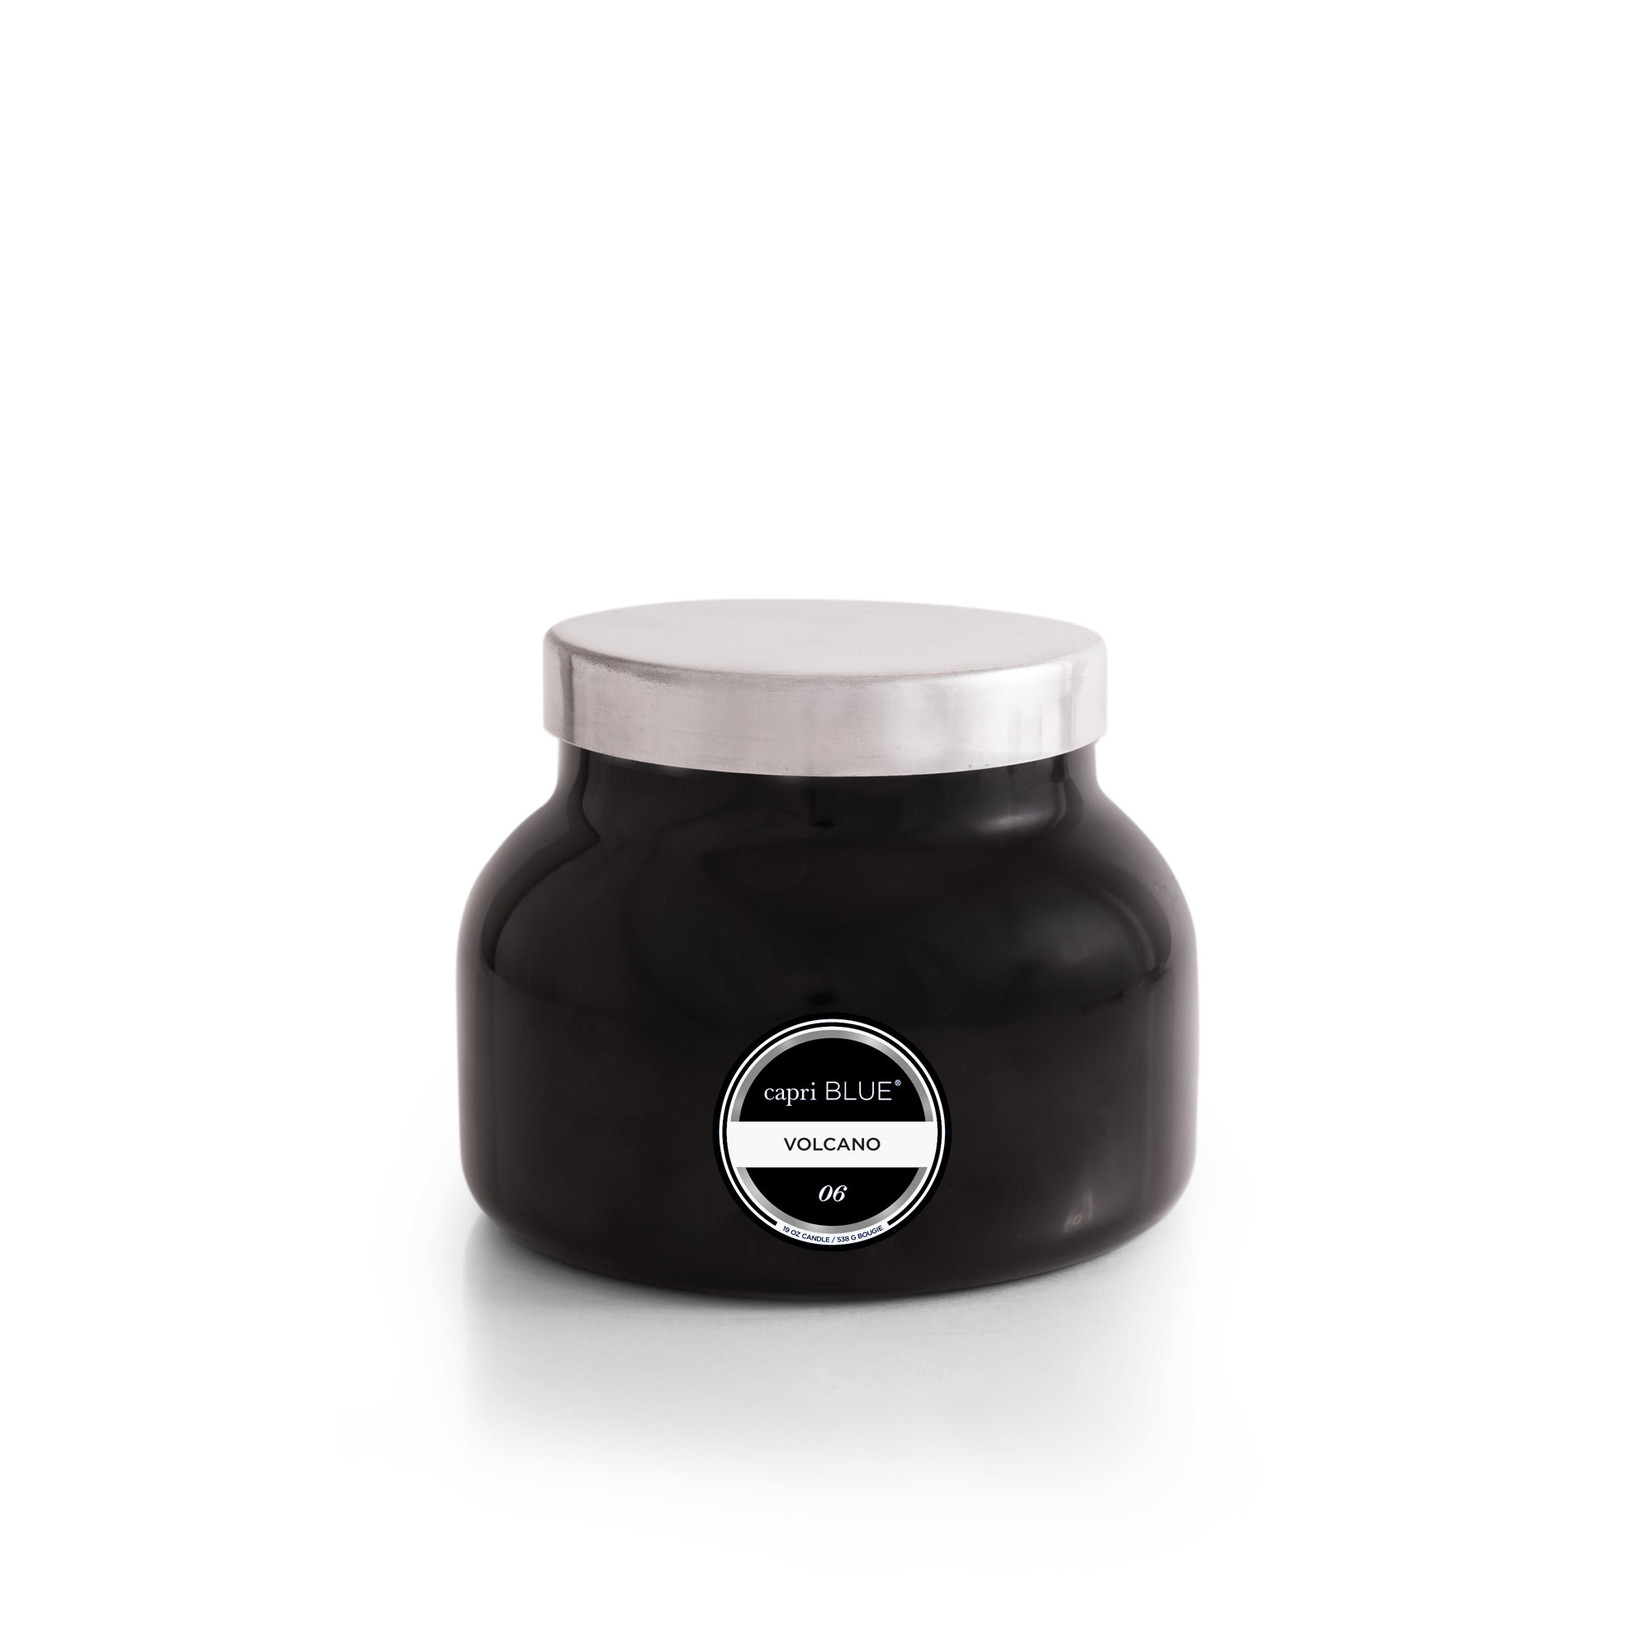 capri BLUE® Black Signature Jar Candle